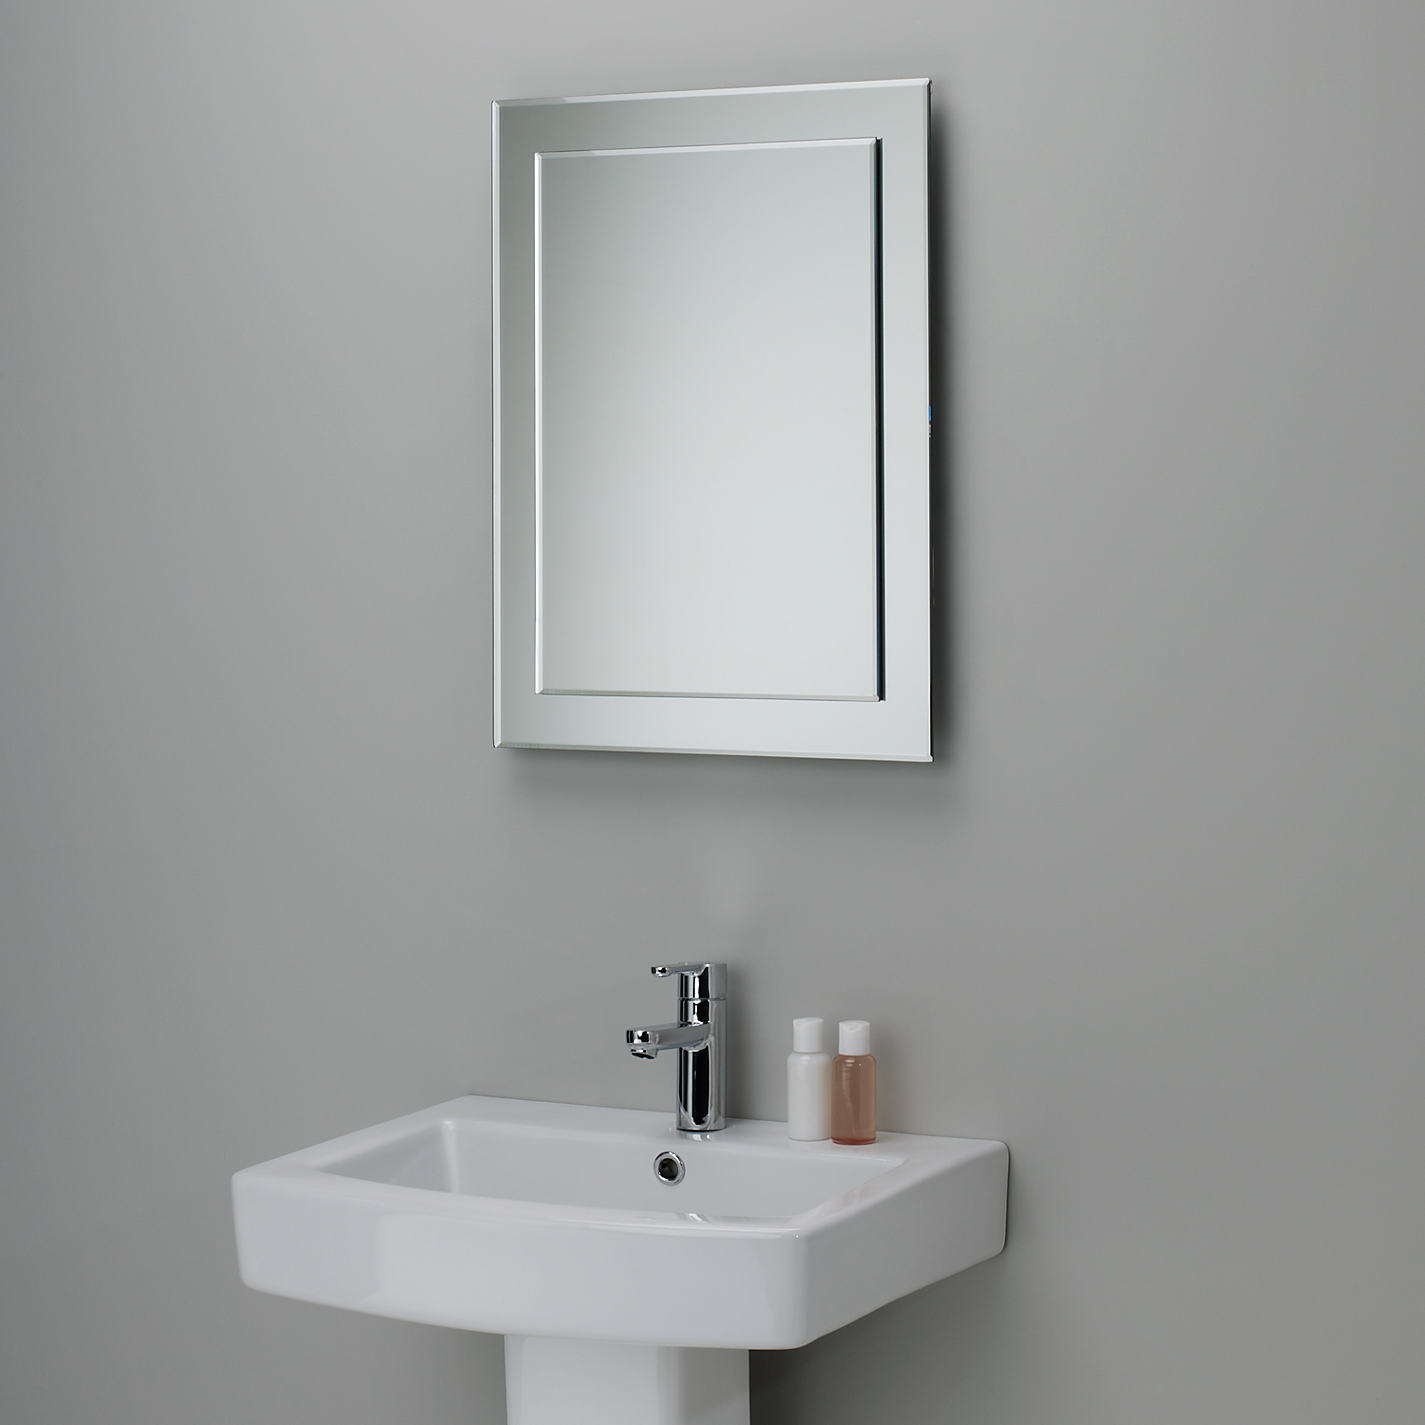 Double Mirrored Bathroom Cabinet Wickes Bathroom Semiframeless Double Mirror Cabinet White 500mm